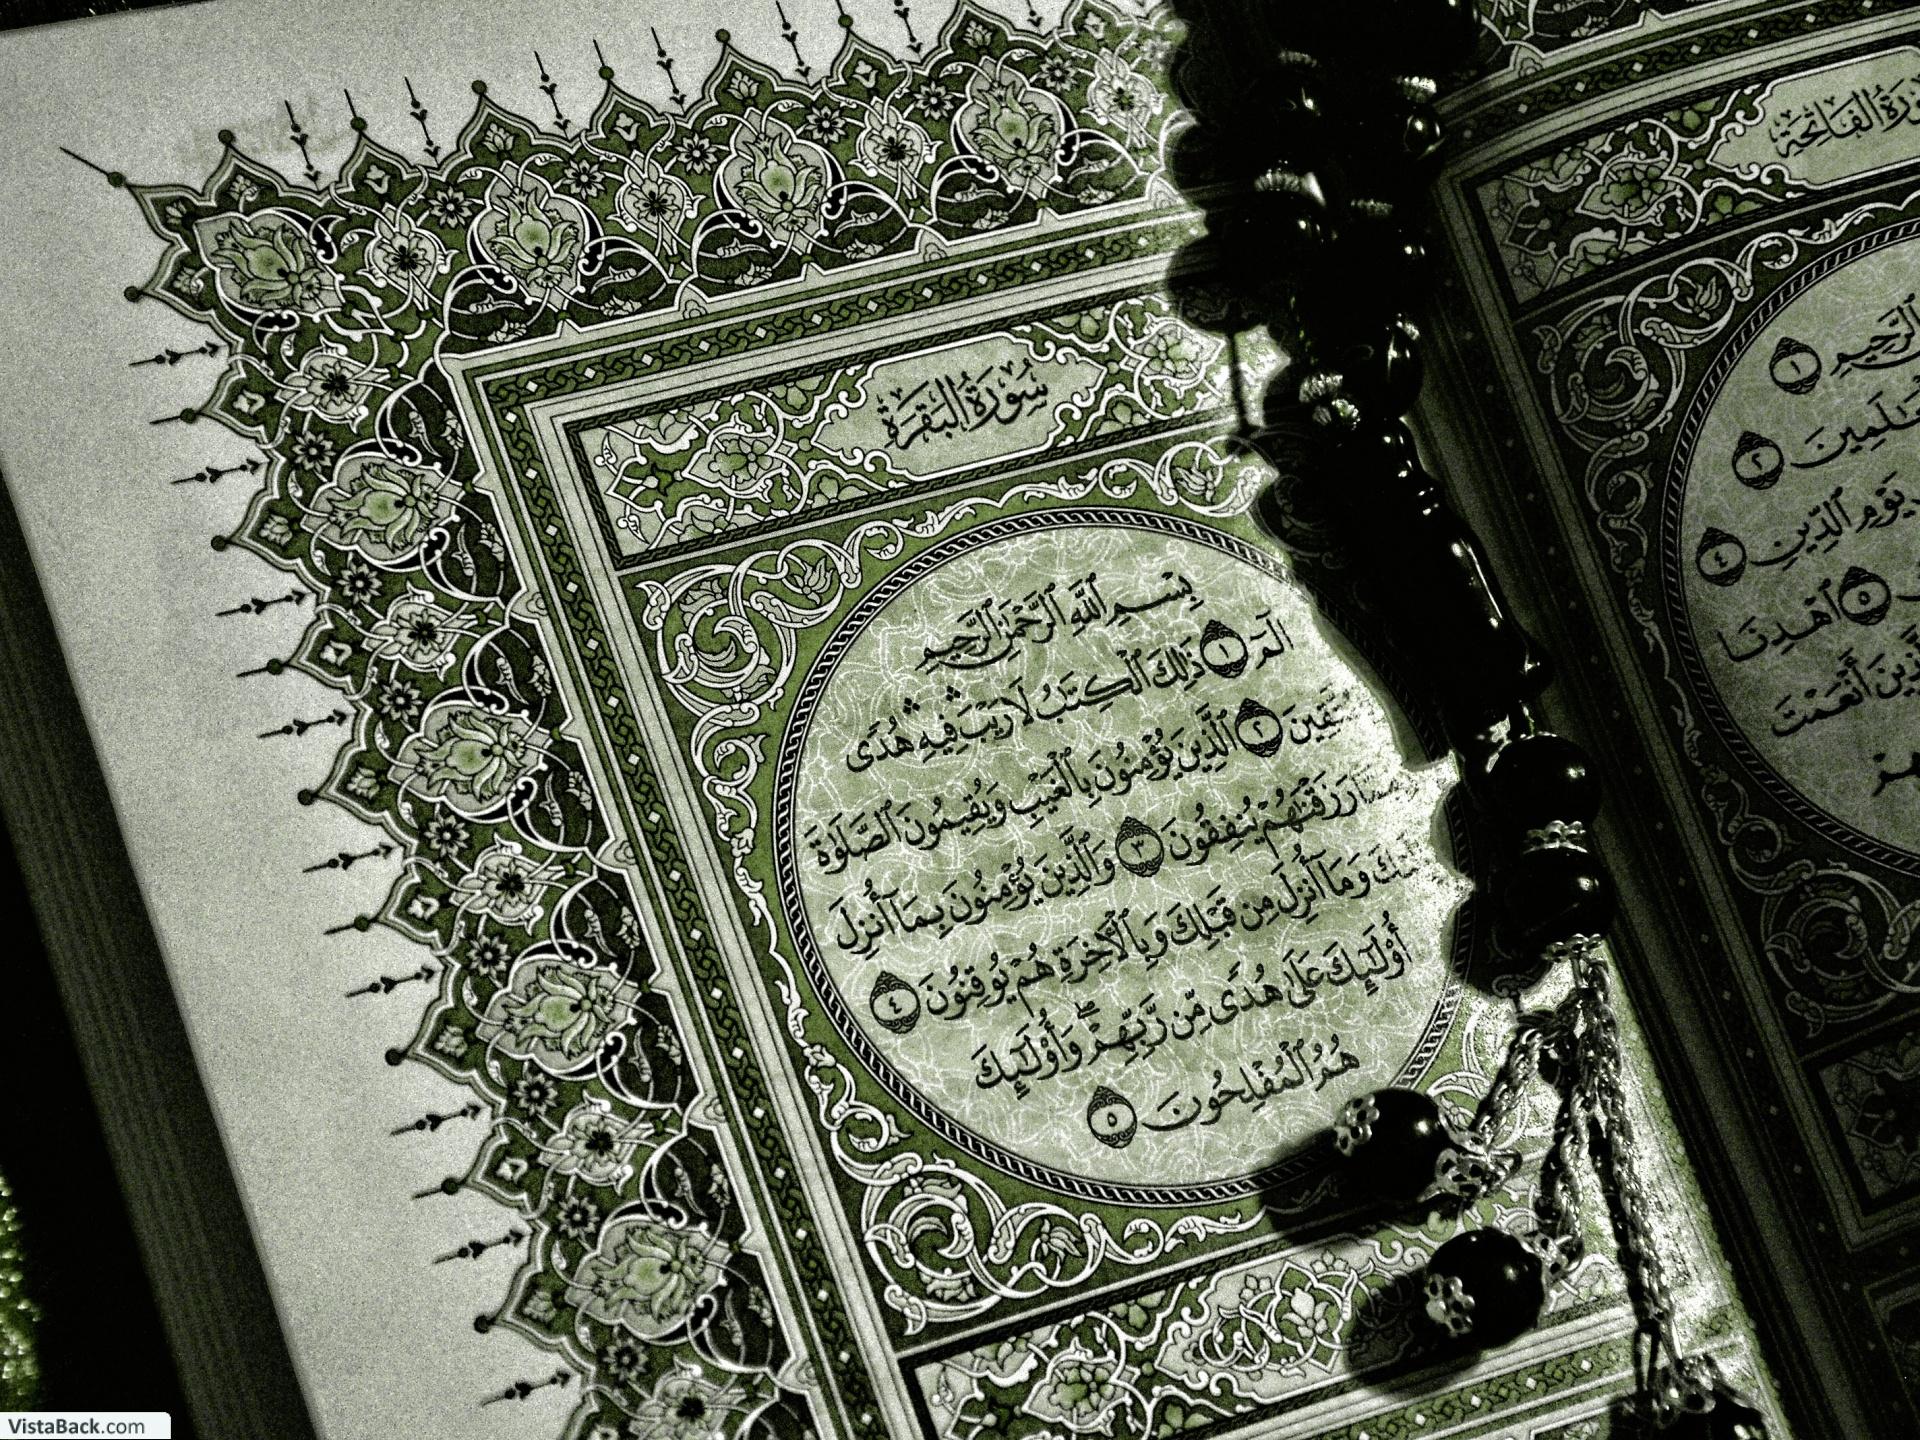 In this episode, Sheikh Osama tackles Surat Al-Falaq